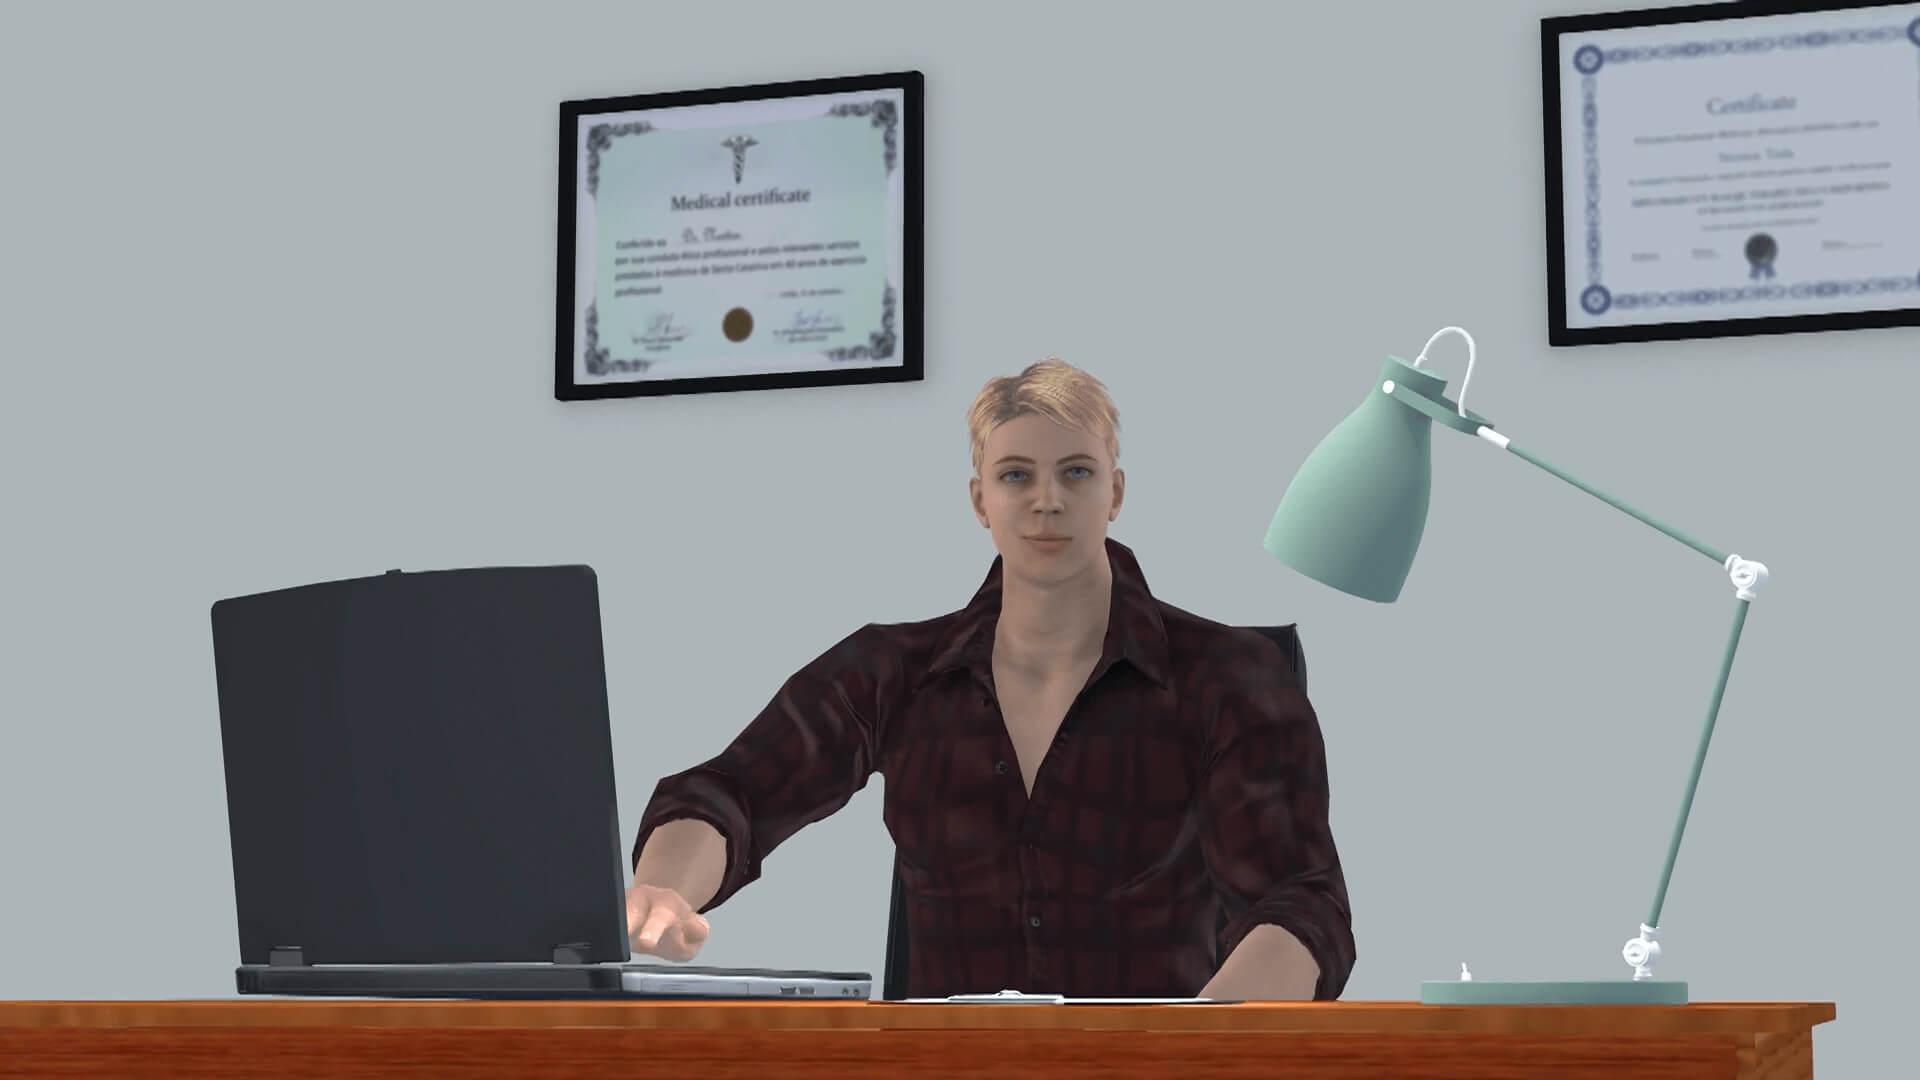 Web Video Example